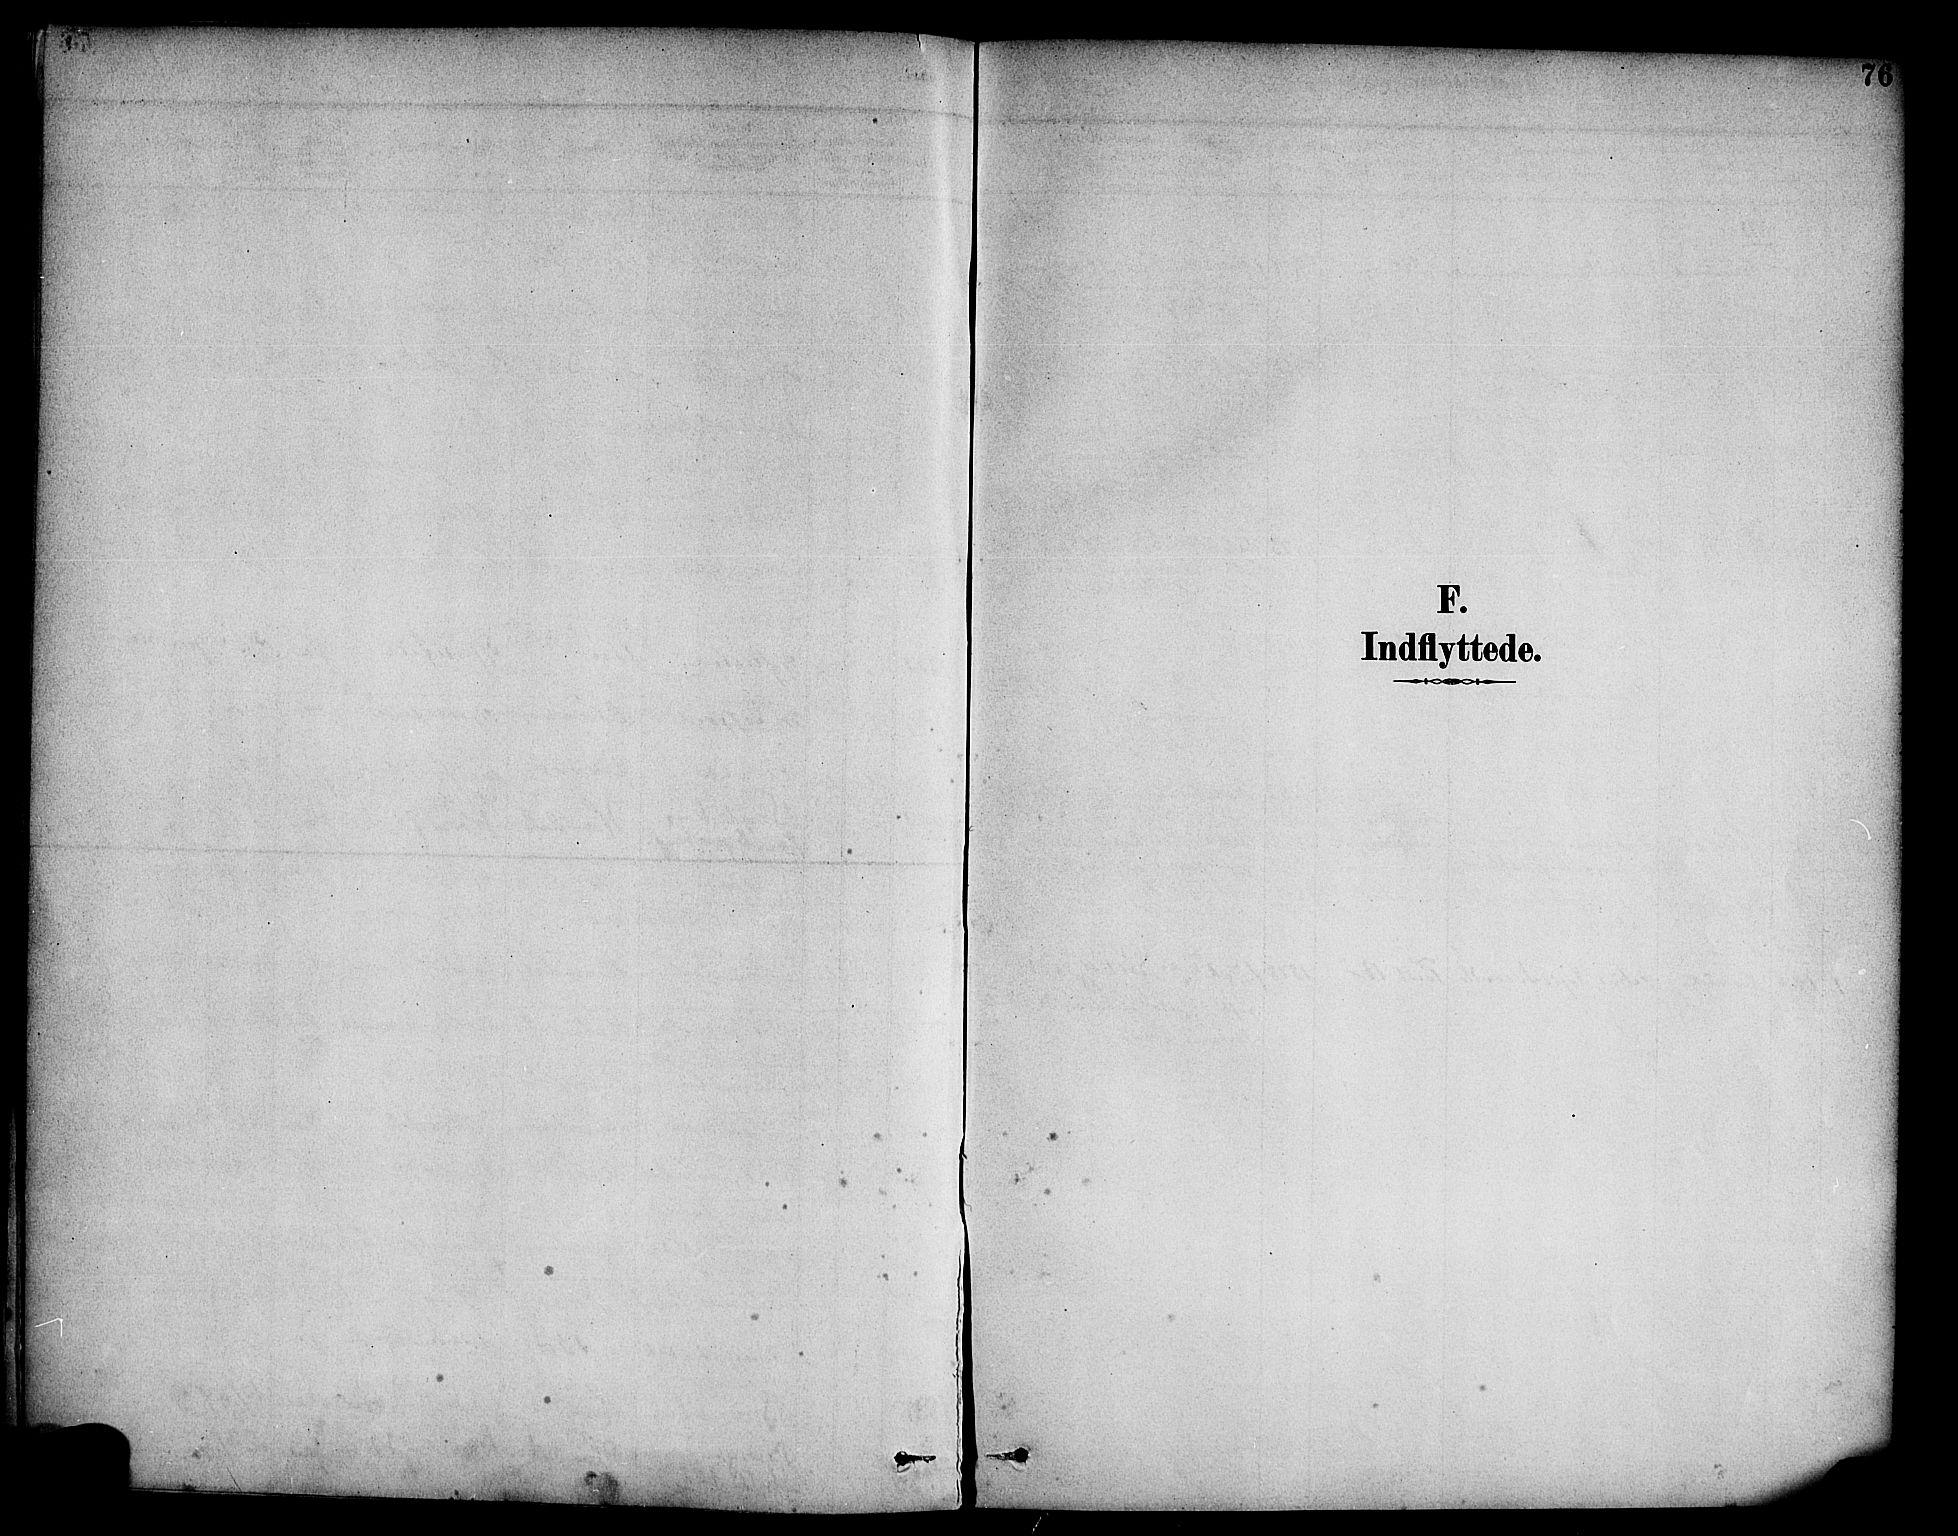 SAB, Hyllestad Sokneprestembete, Ministerialbok nr. C 1, 1886-1904, s. 76